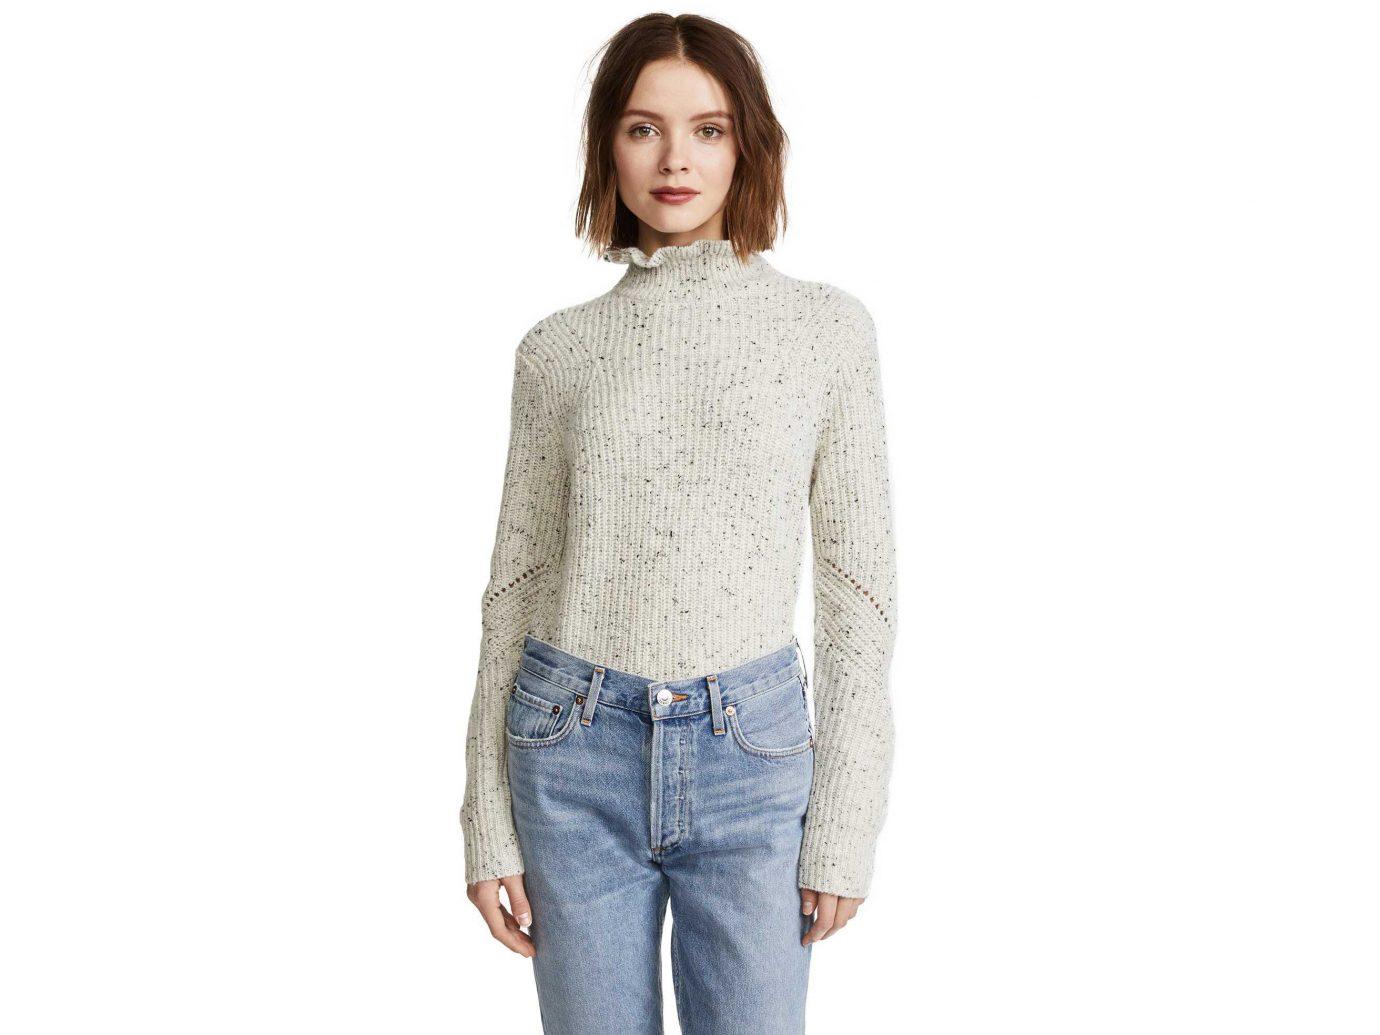 979c5dedc 17 Best Winter Sweaters for Women